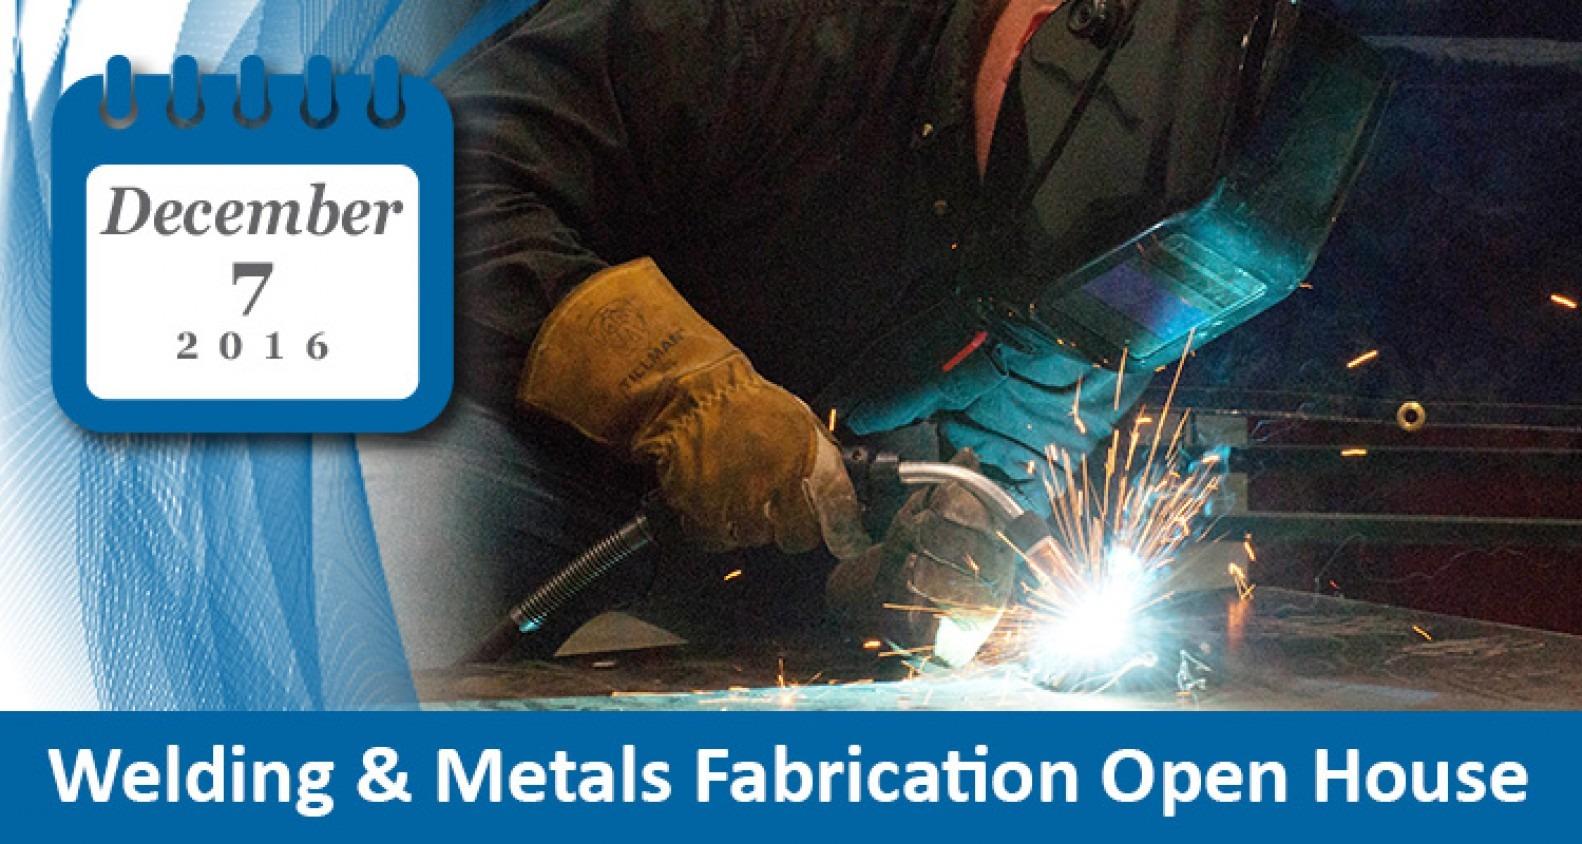 Welding & Metals Fabrication Open House | December 7, 2016